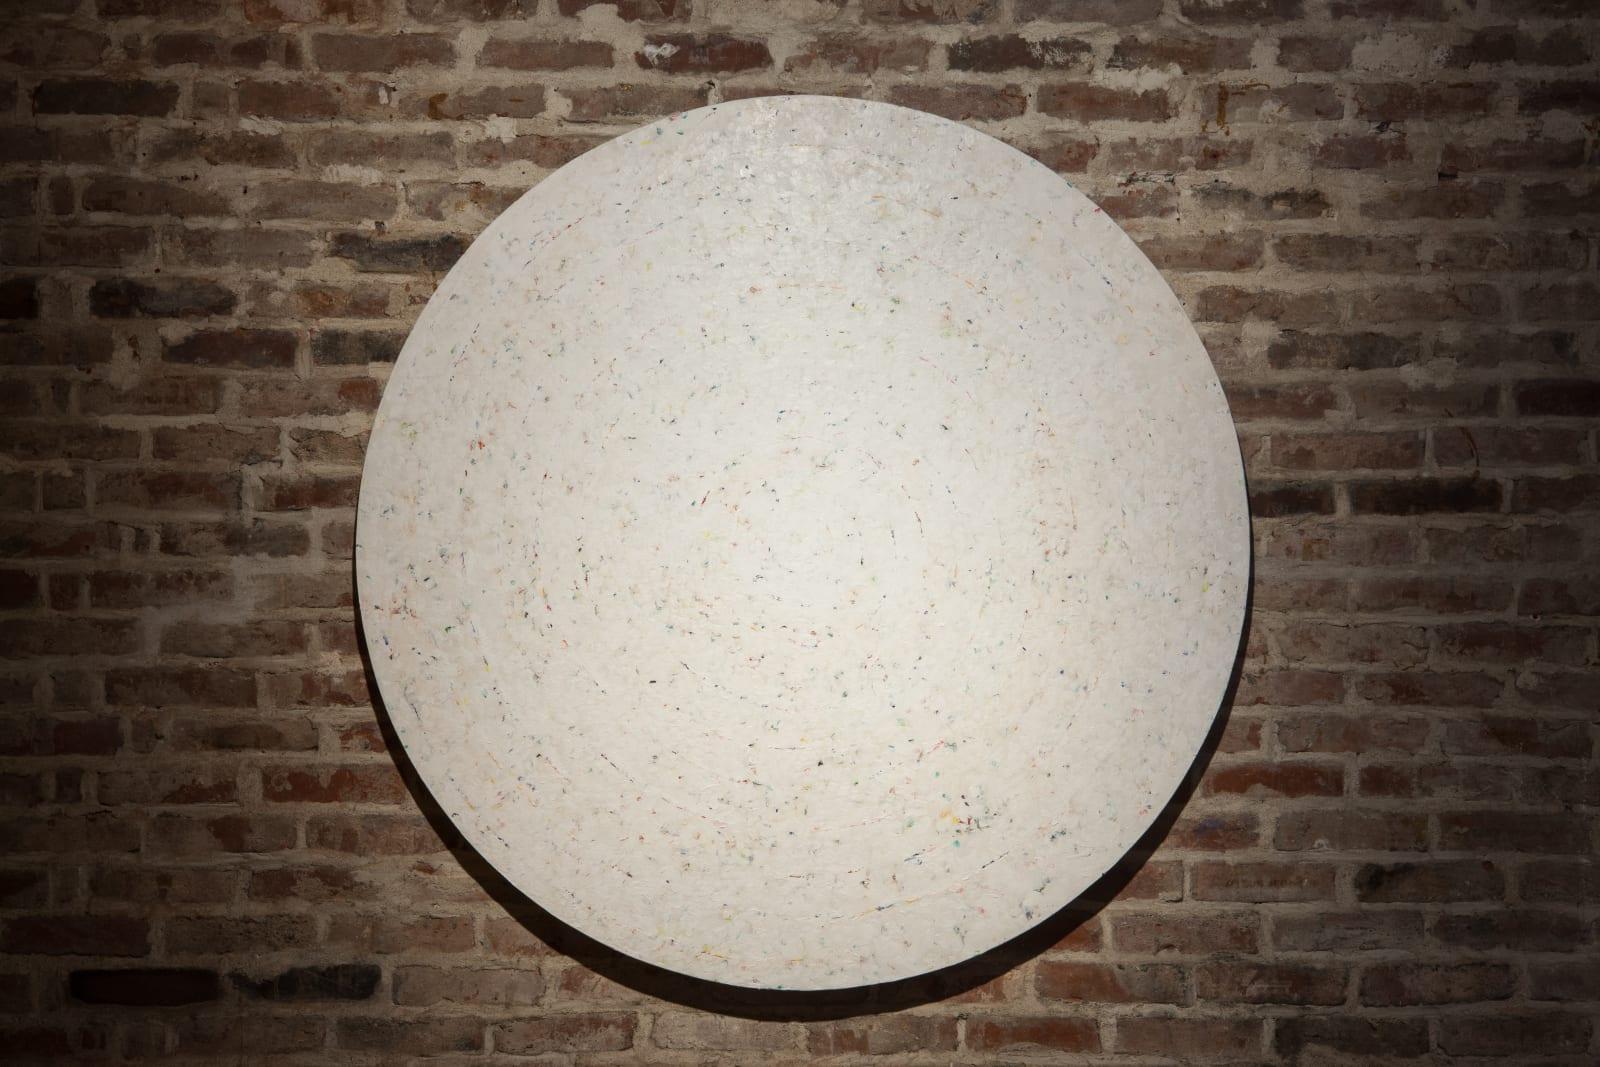 Kim Soungui , 그림-과녁-흰색 Peinture-Cible-White, 1985-1986